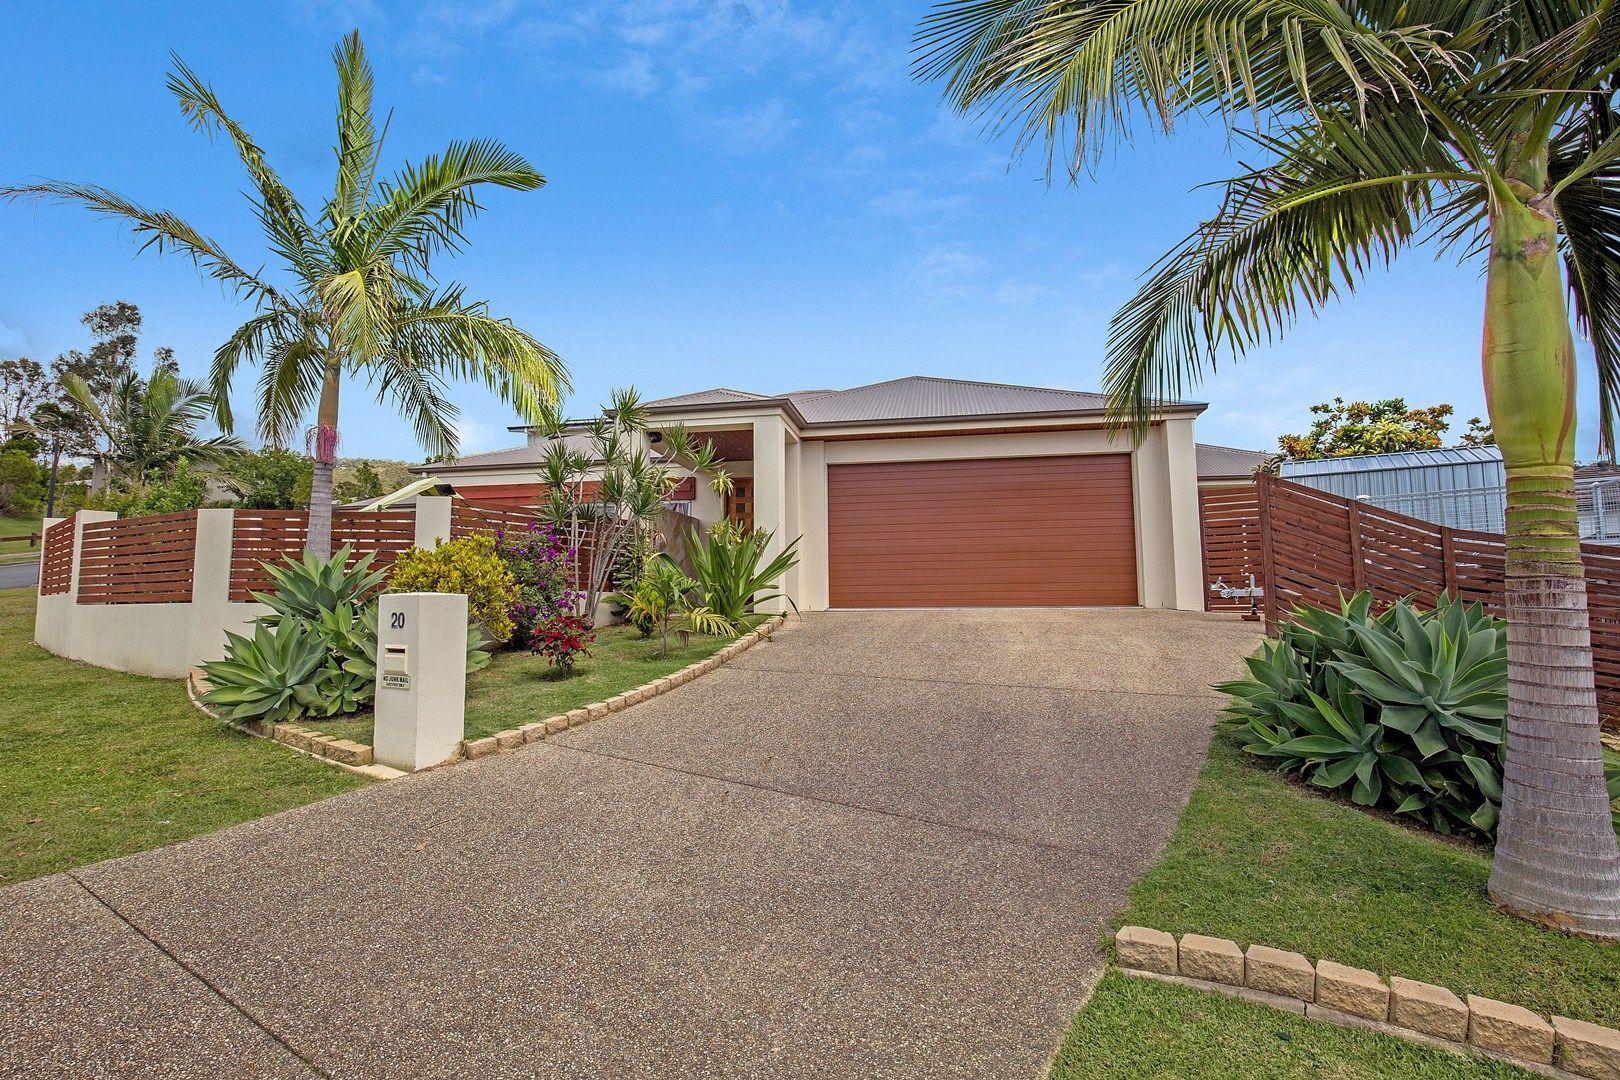 20 Abercrombie Crescent, Upper Coomera QLD 4209, Image 0